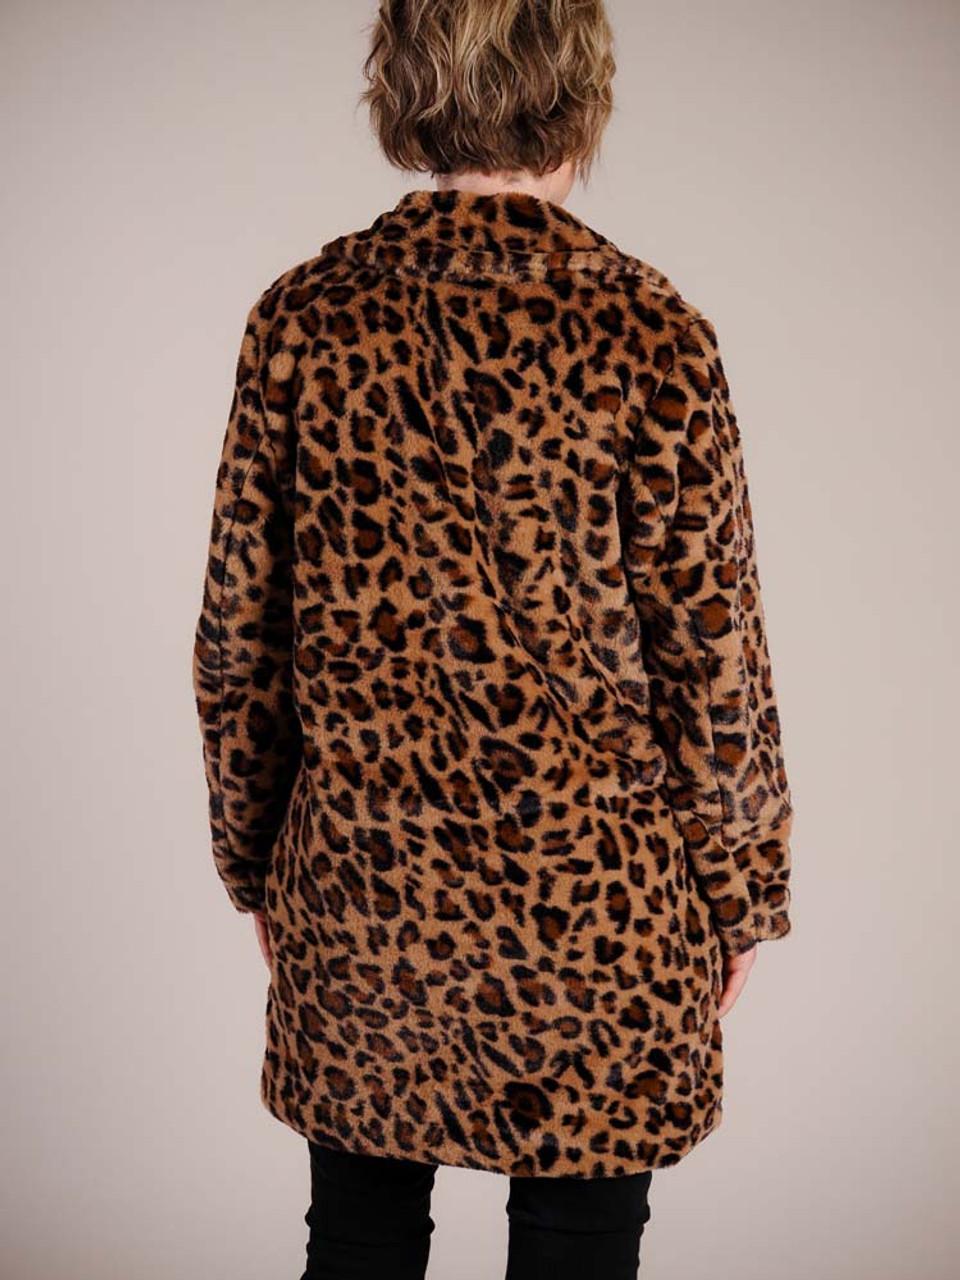 leopard print jacket faux fur